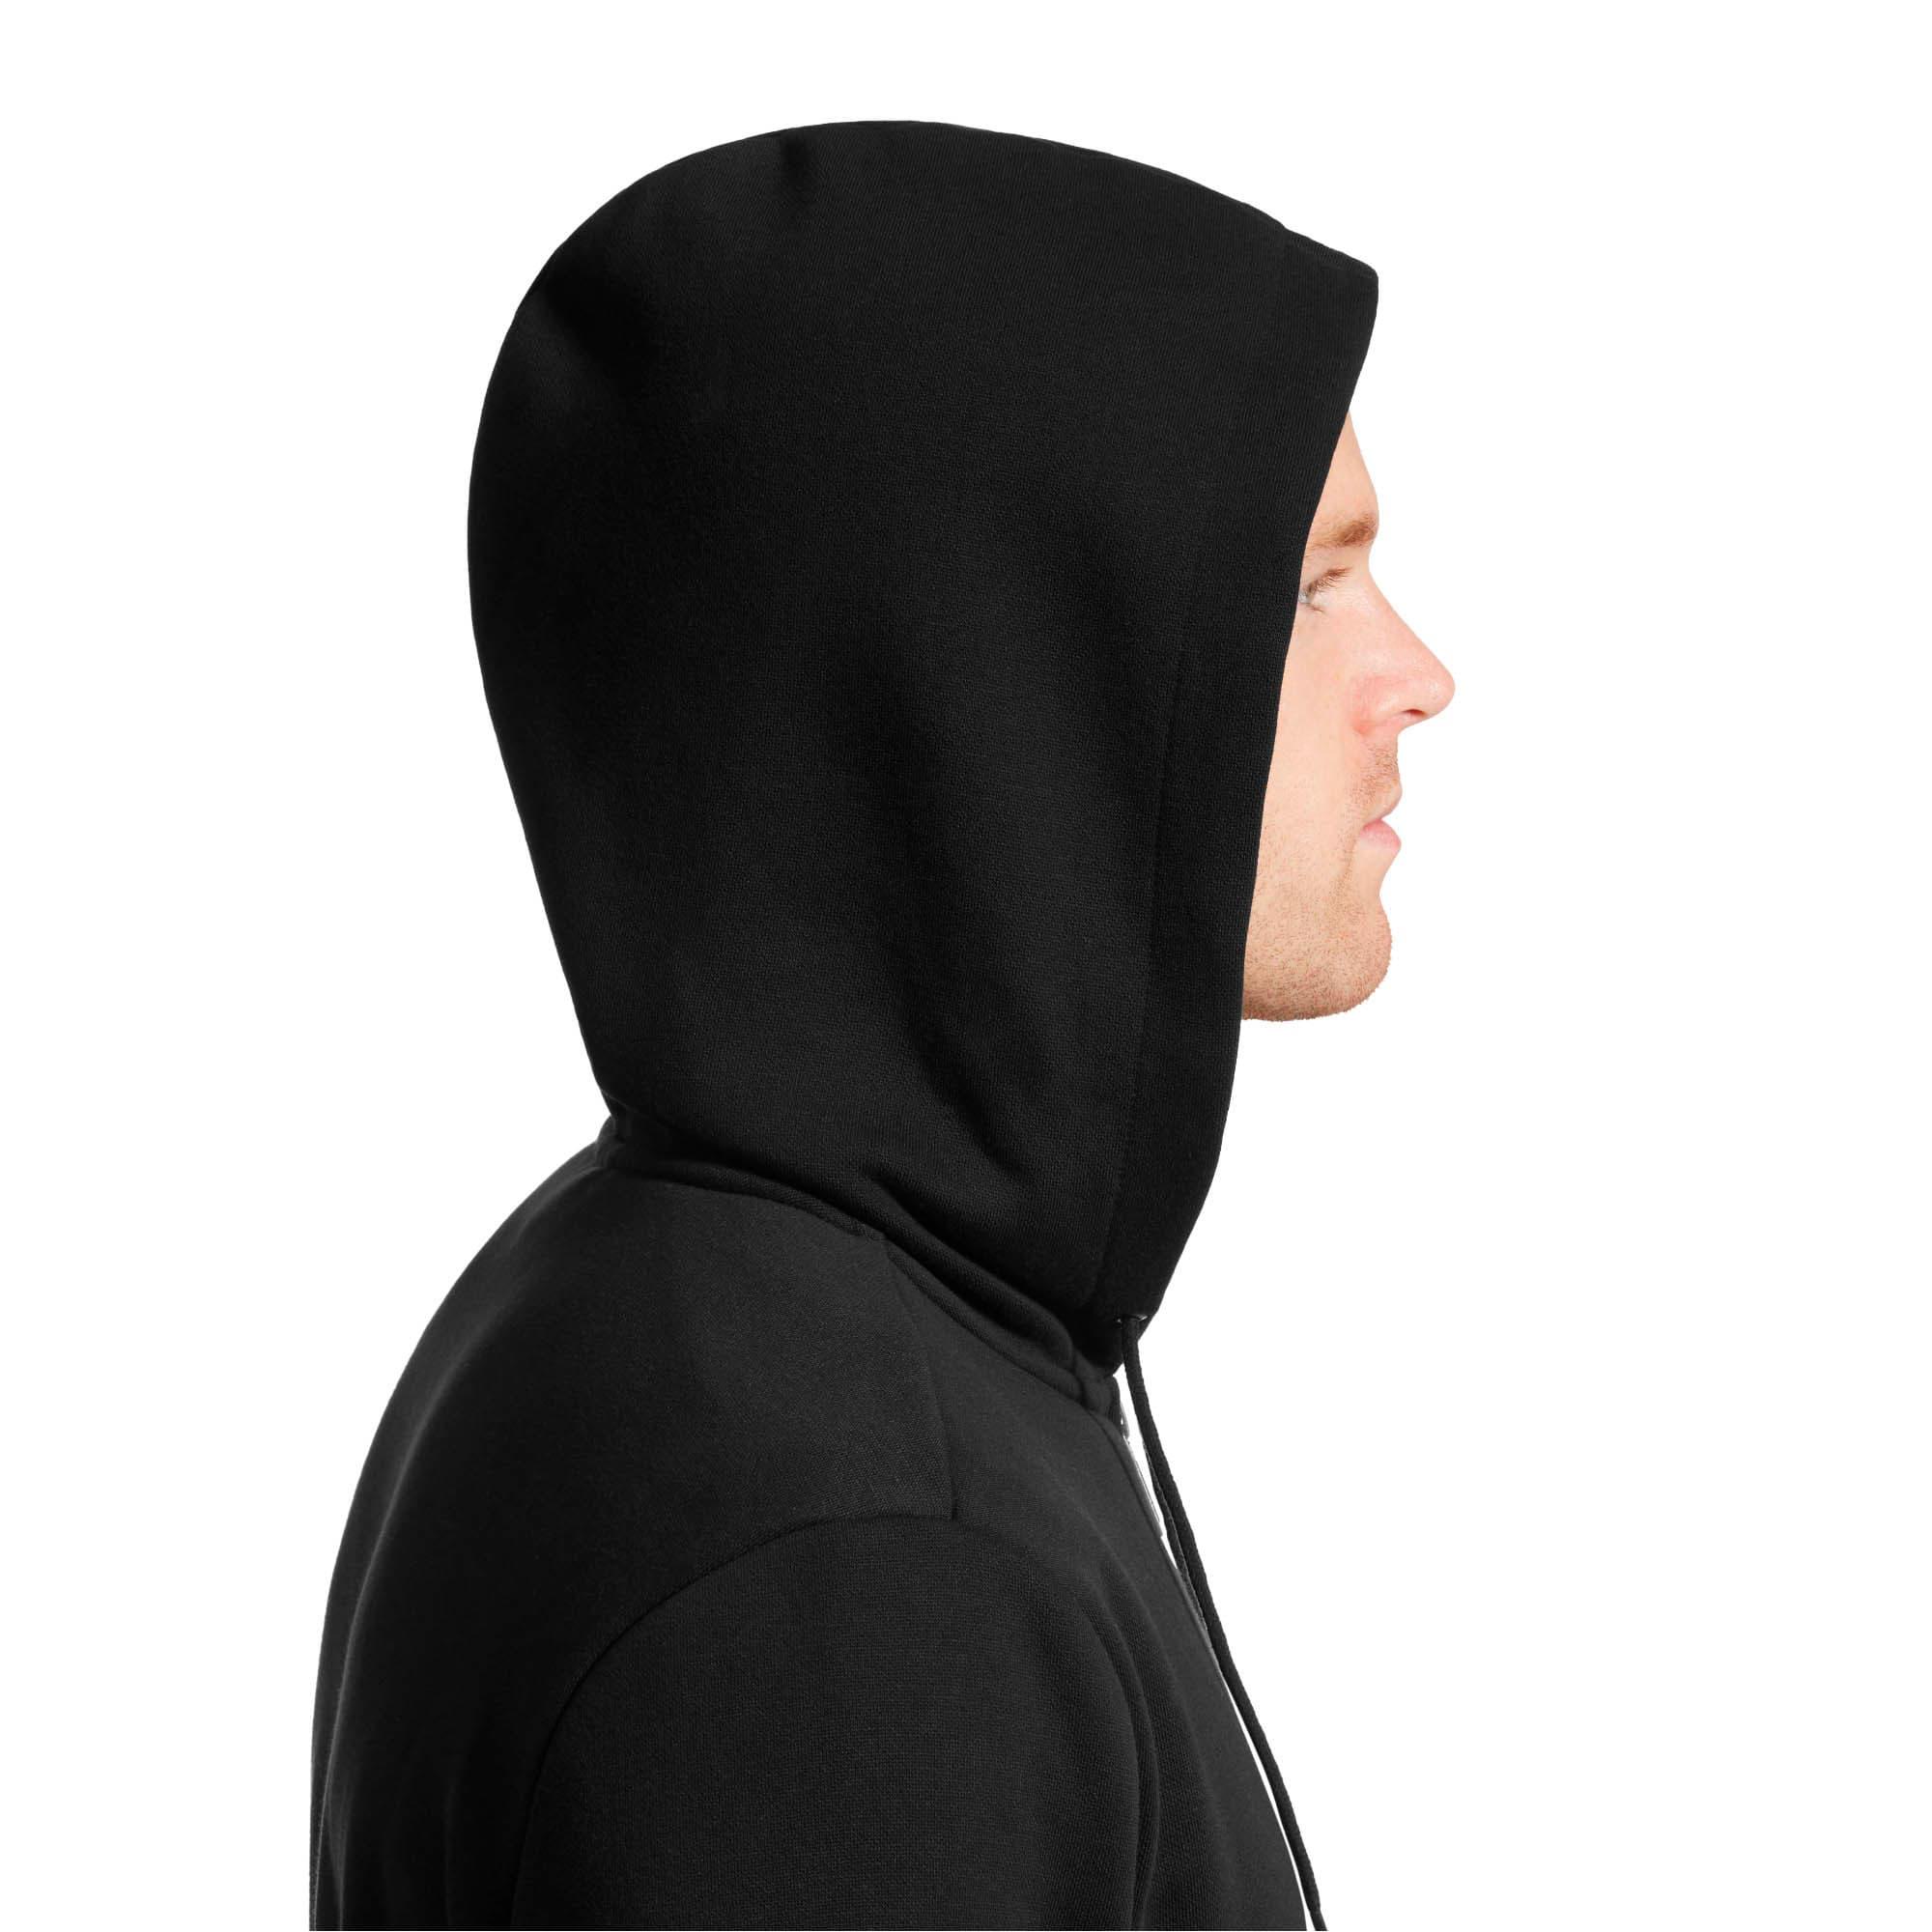 Thumbnail 6 of Essentials Men's Hooded Fleece Jacket, Puma Black, medium